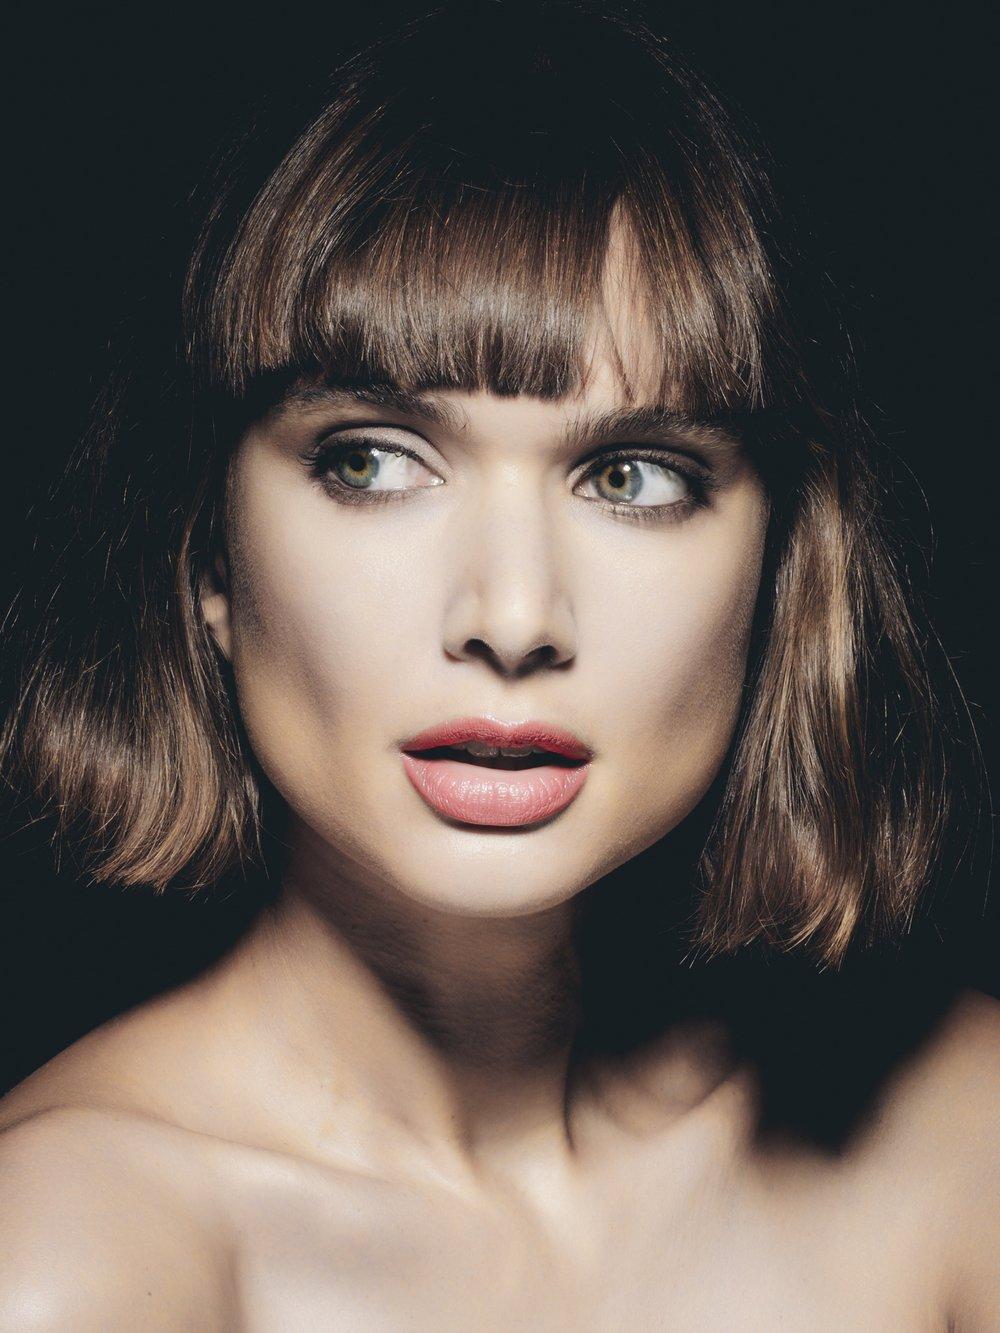 Rebecca Pearson Model Beauty Photoshoot Demonstration CameraWorld Live Jay McLaughlin Olympus OM-D E-M1 MarkII